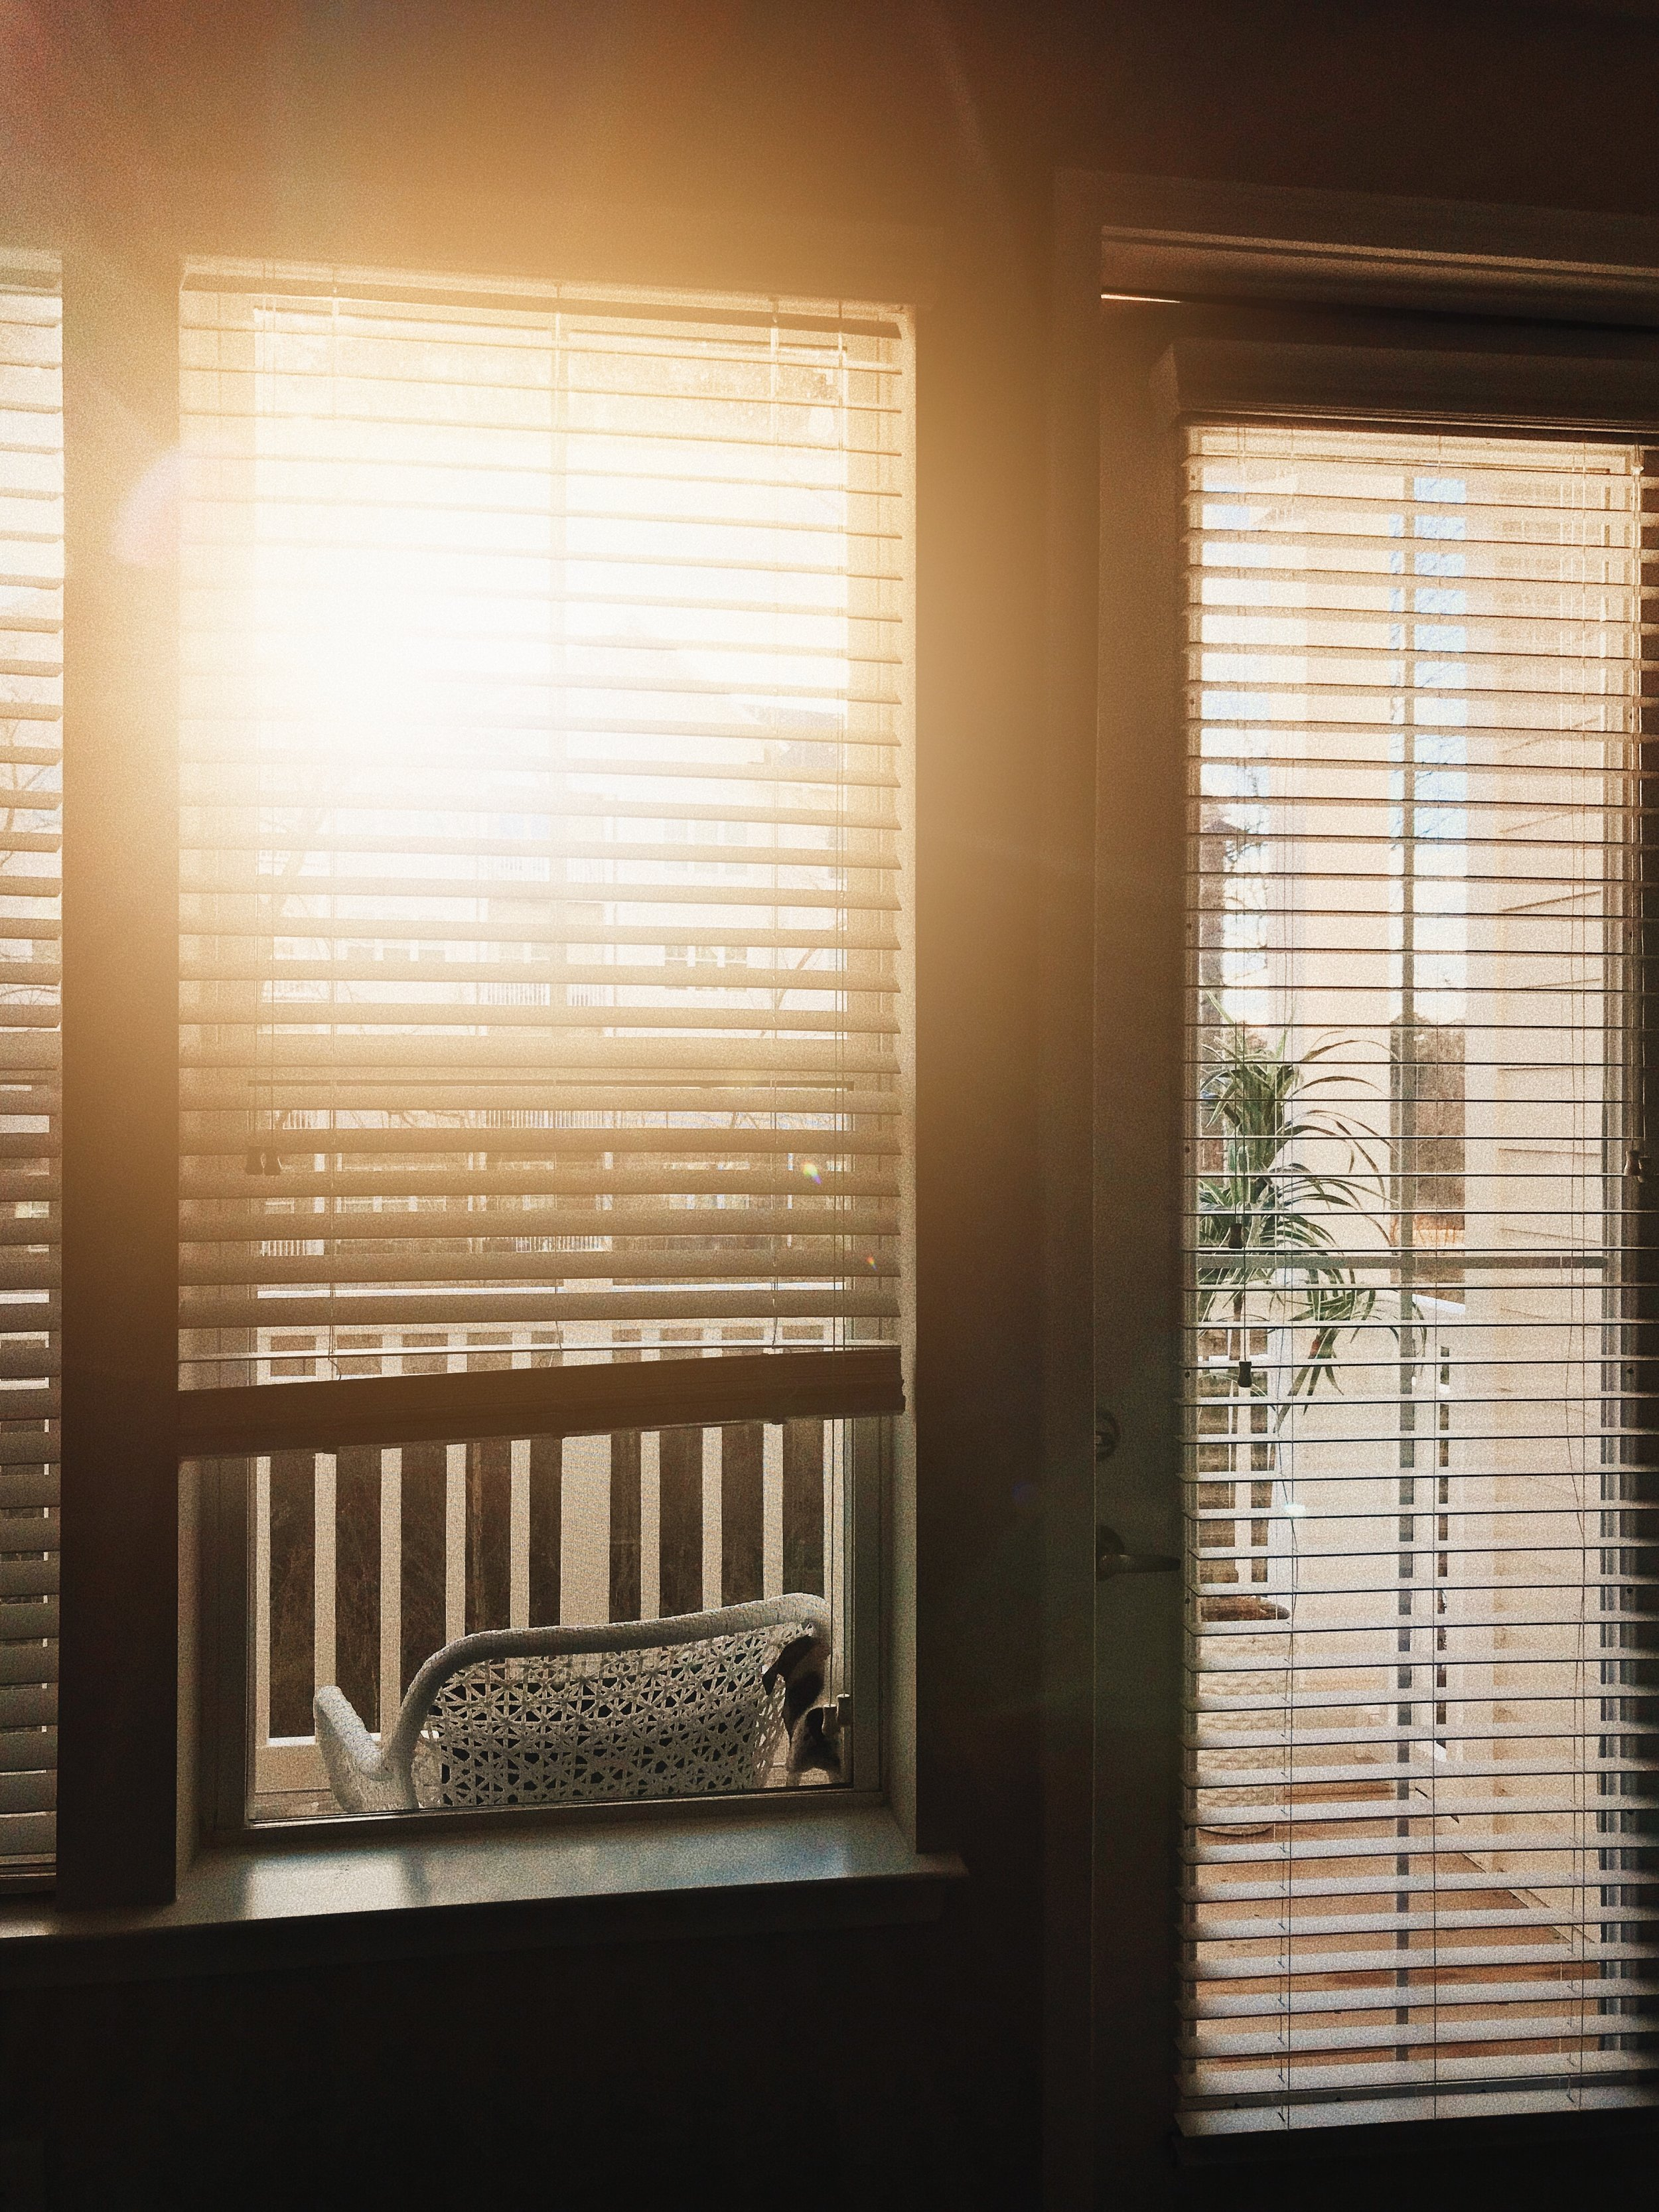 Dixie Looking Into Window